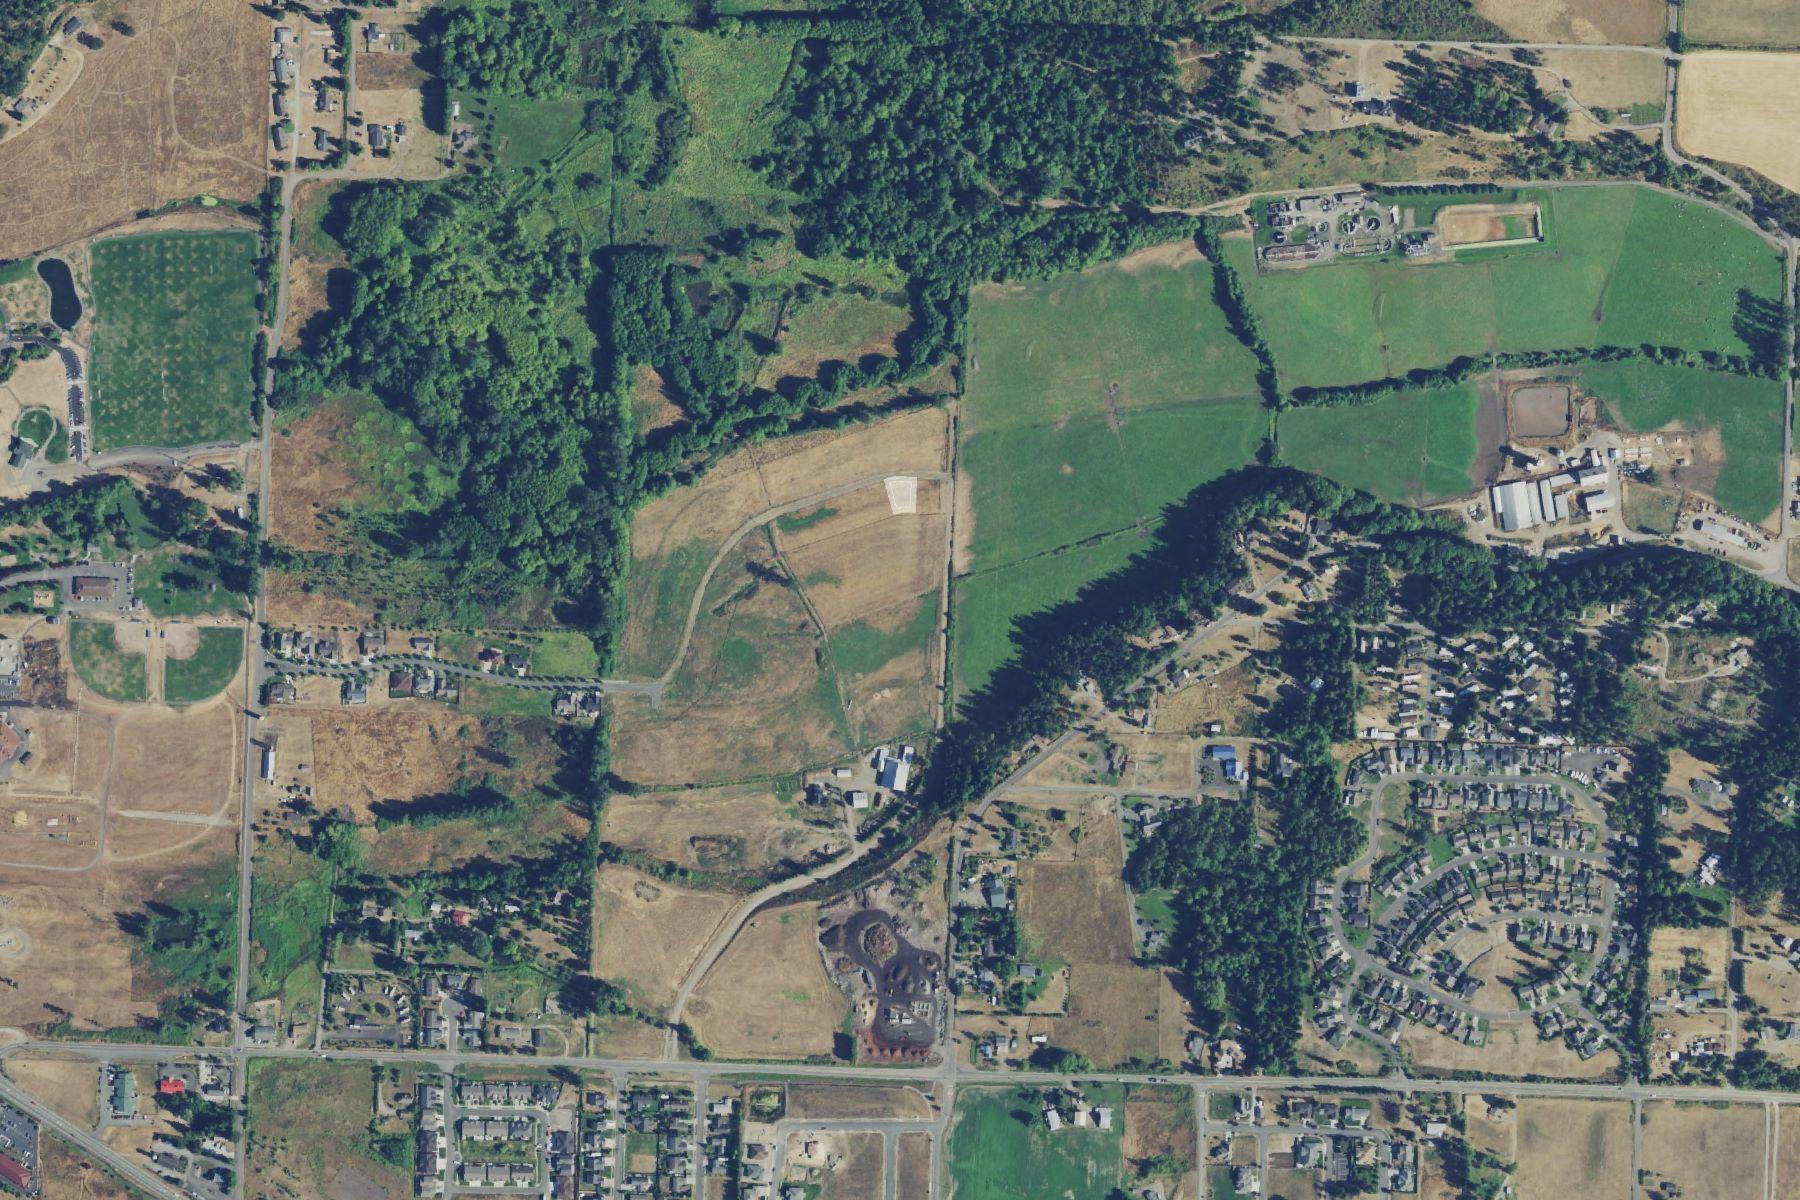 Land for Sale at 480 Broadmoor Street, Sequim, WA 98382 Sequim, Washington 98382 United States